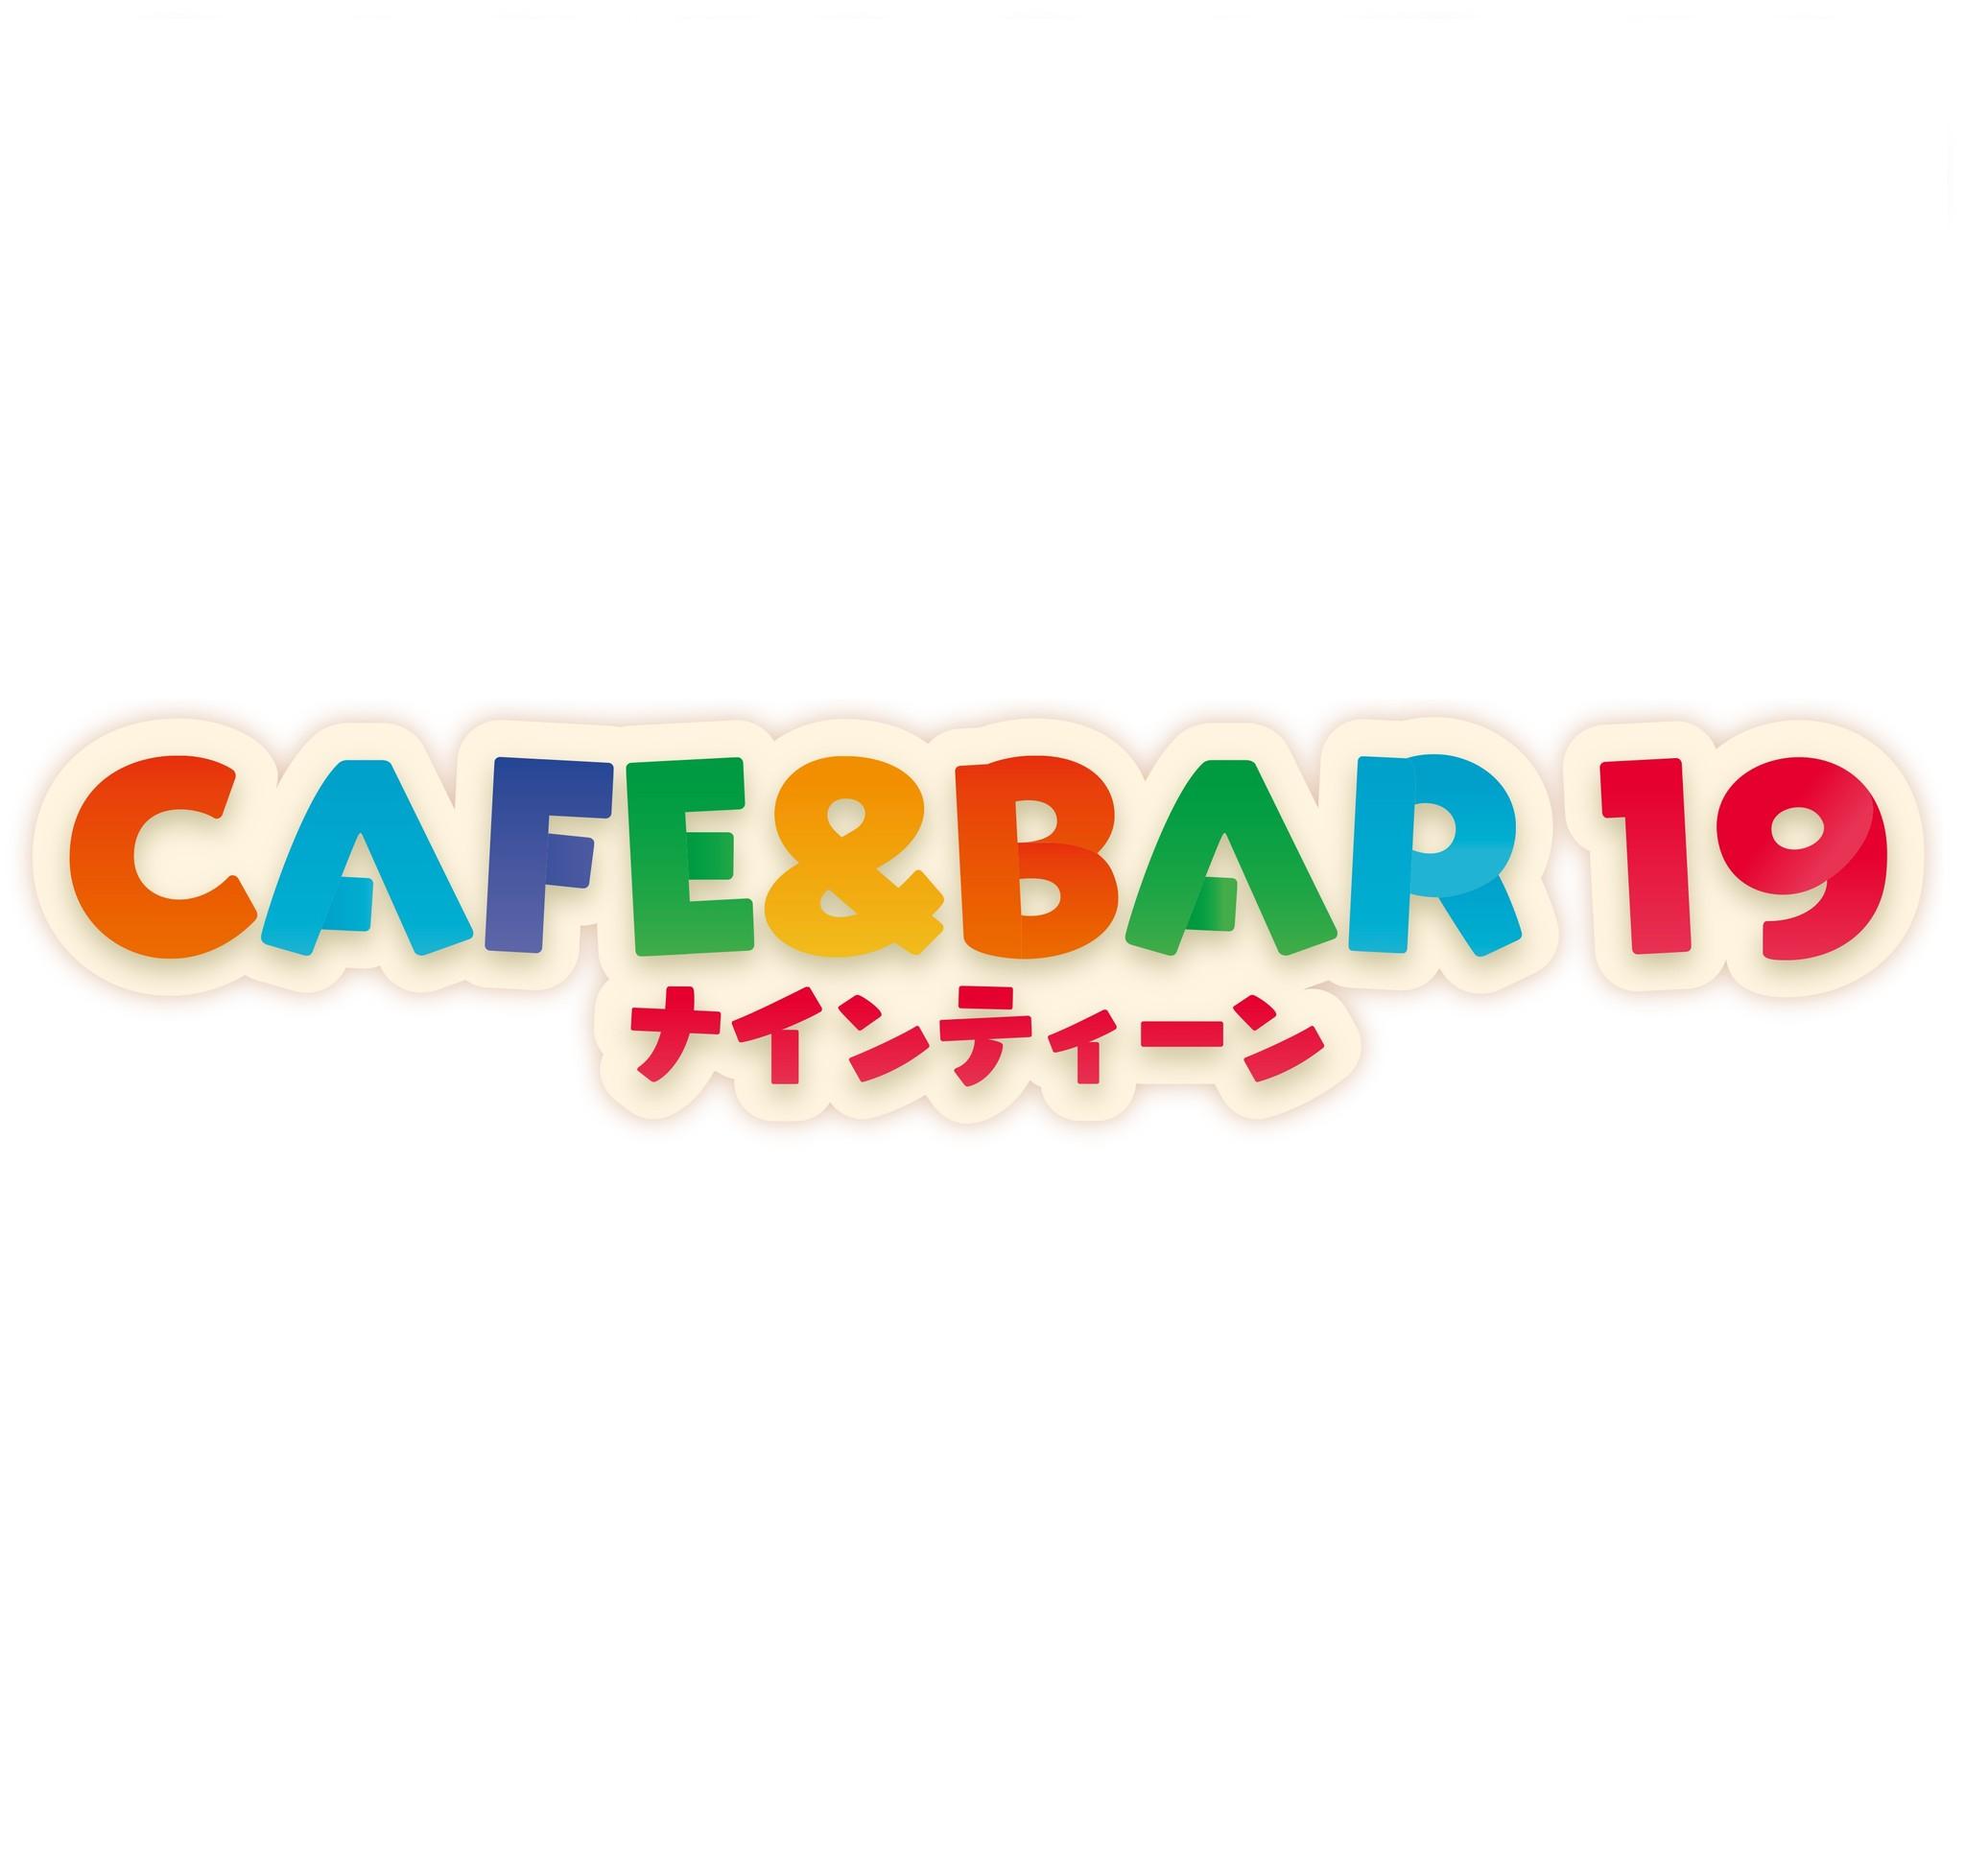 CAFE&BAR19